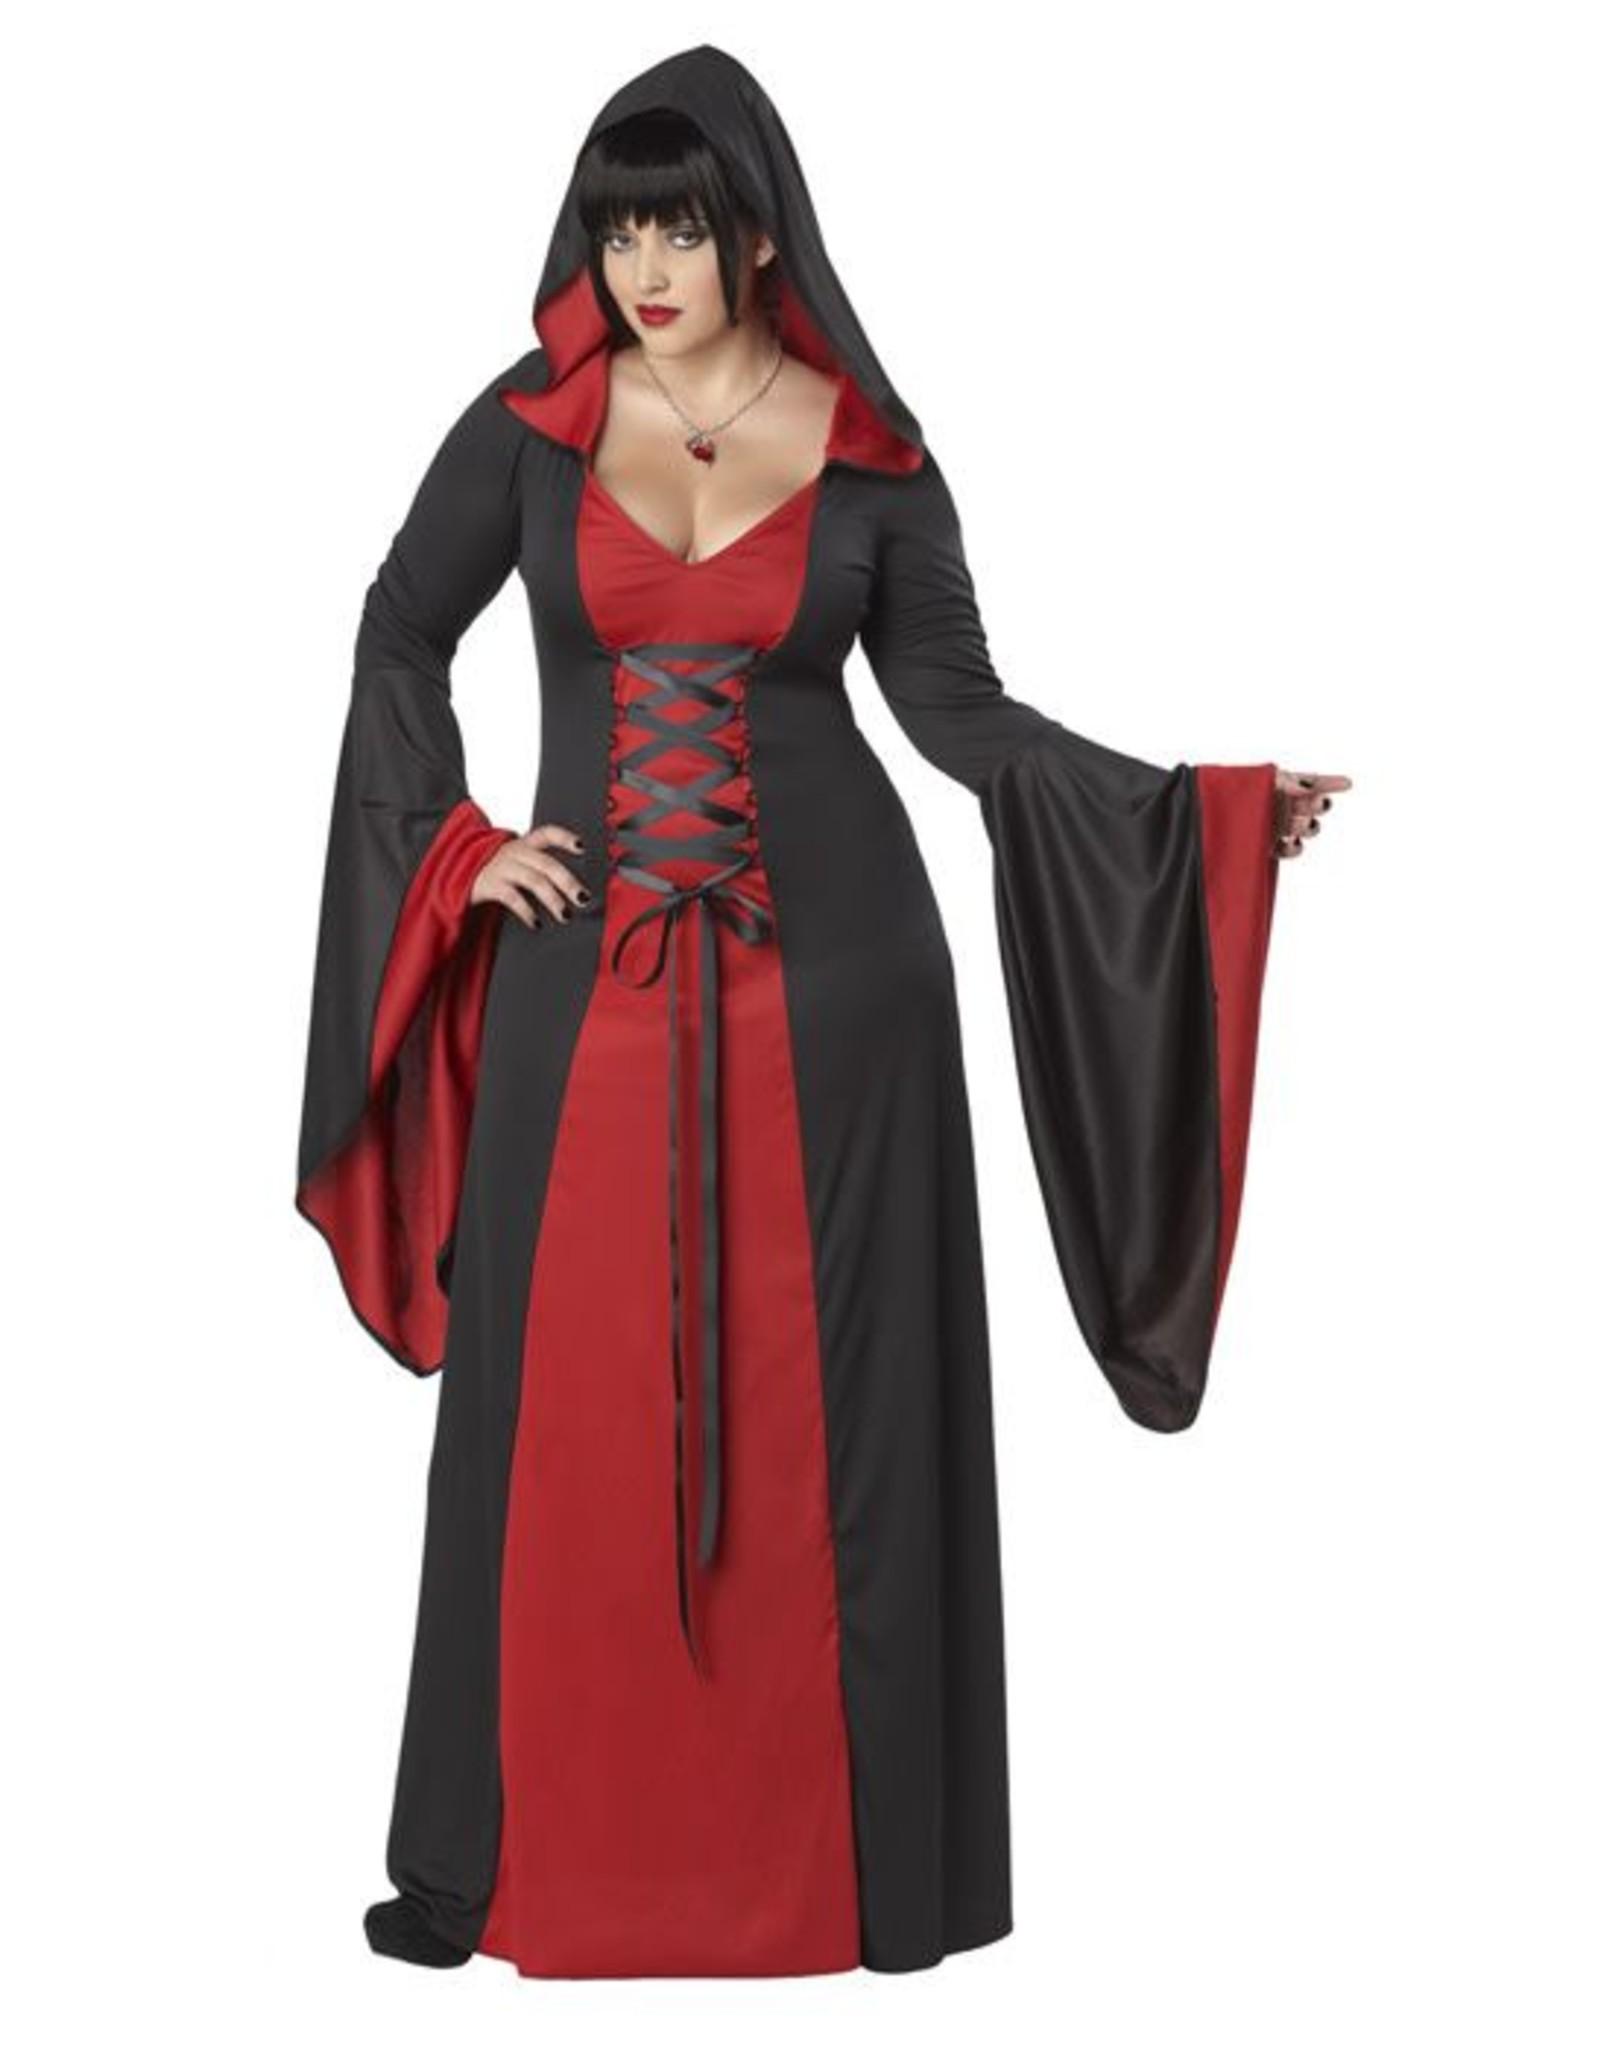 California Costume Hooded Robe 1X (16-18)